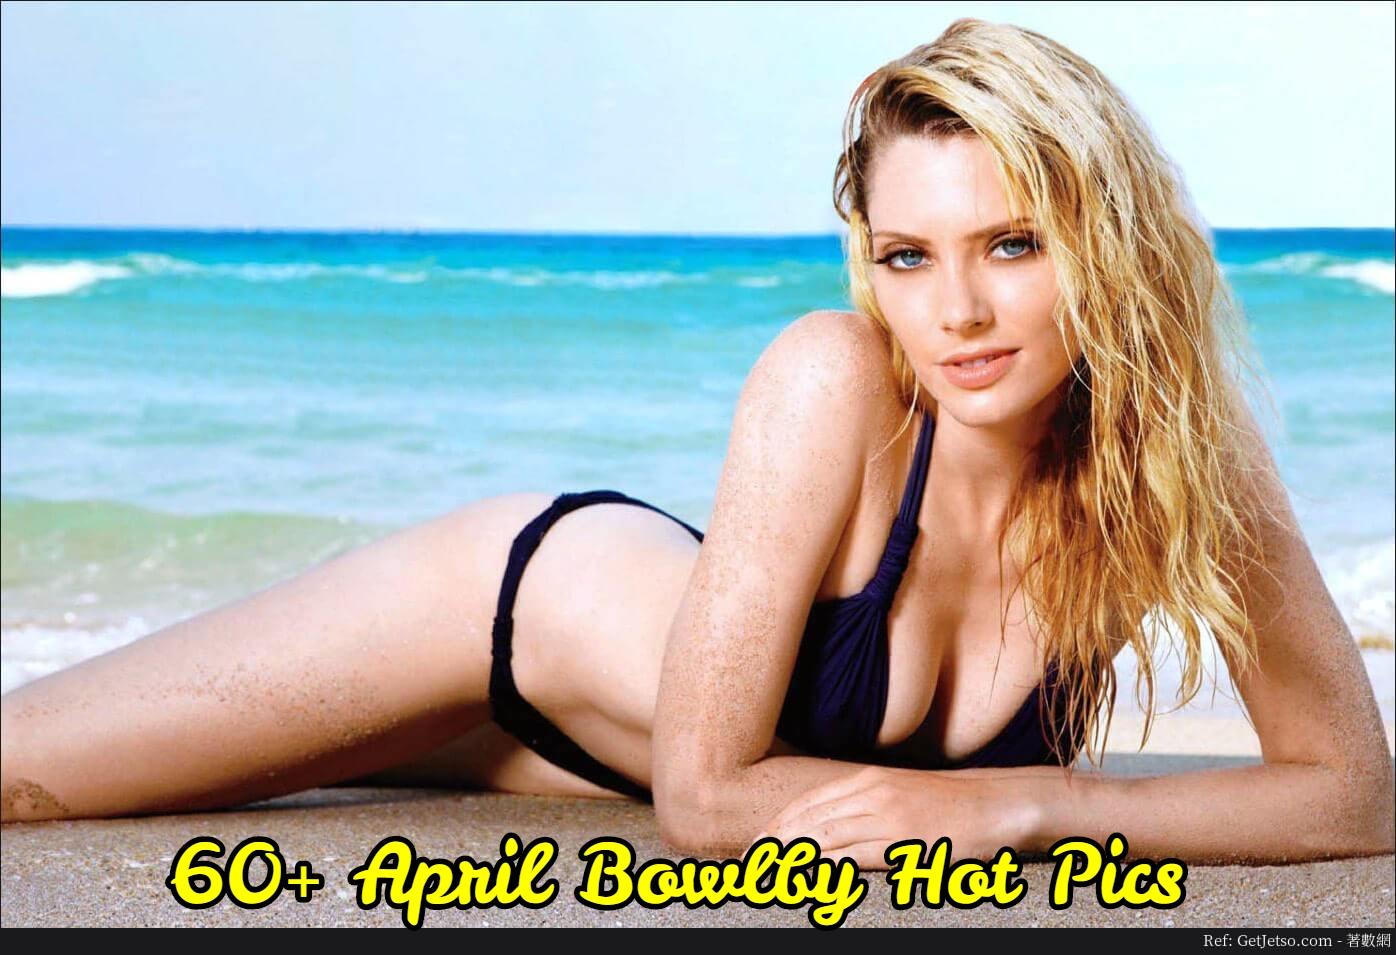 April Bowlby hairs